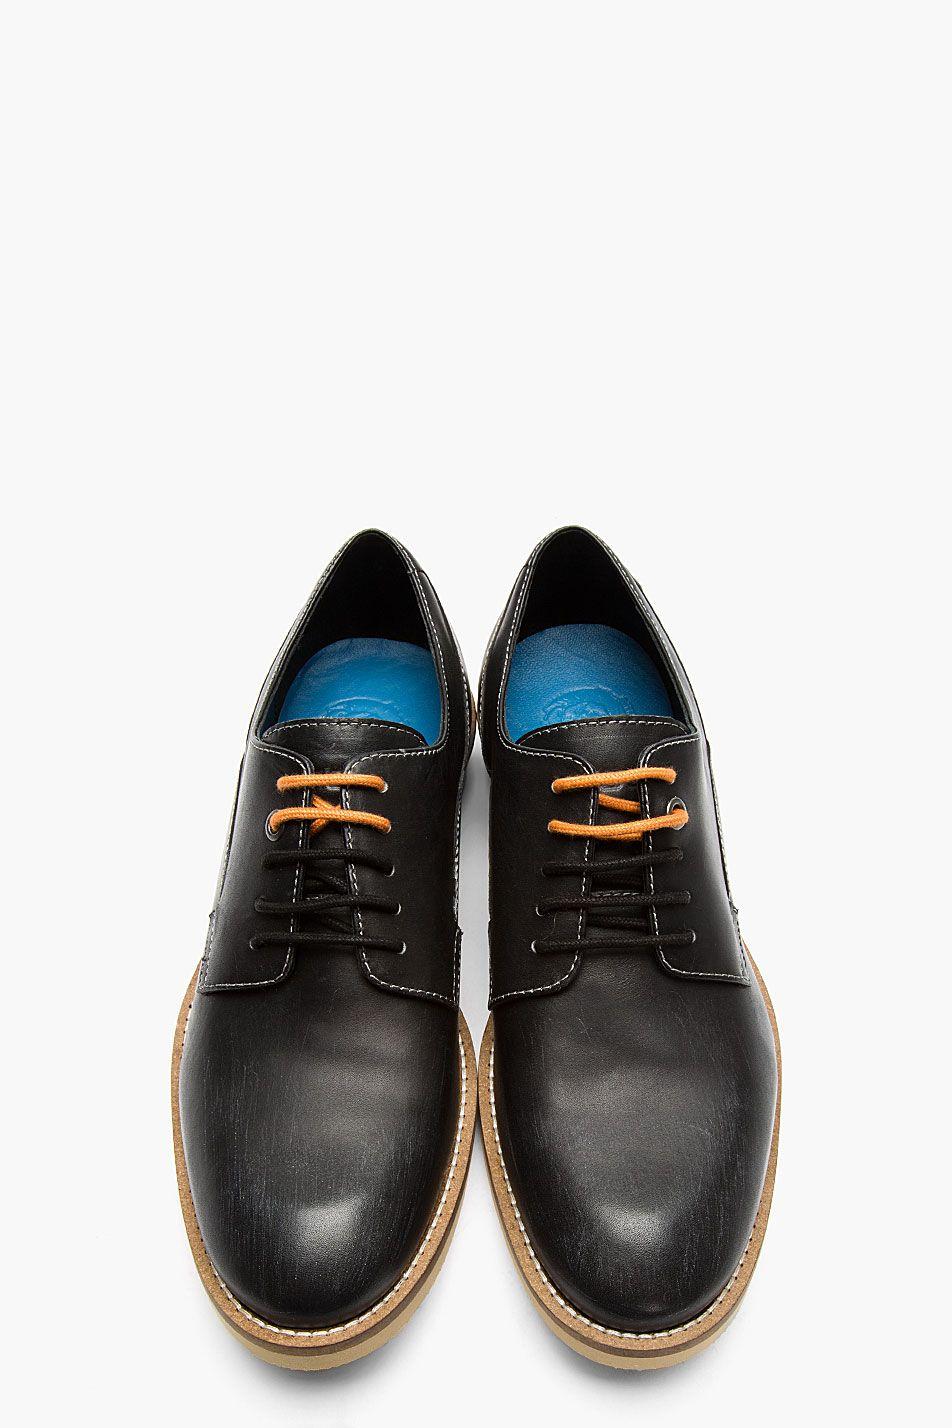 DIESEL Black Leather Two Tone-Laced Ellington Derby Shoes #WhatIWouldWear